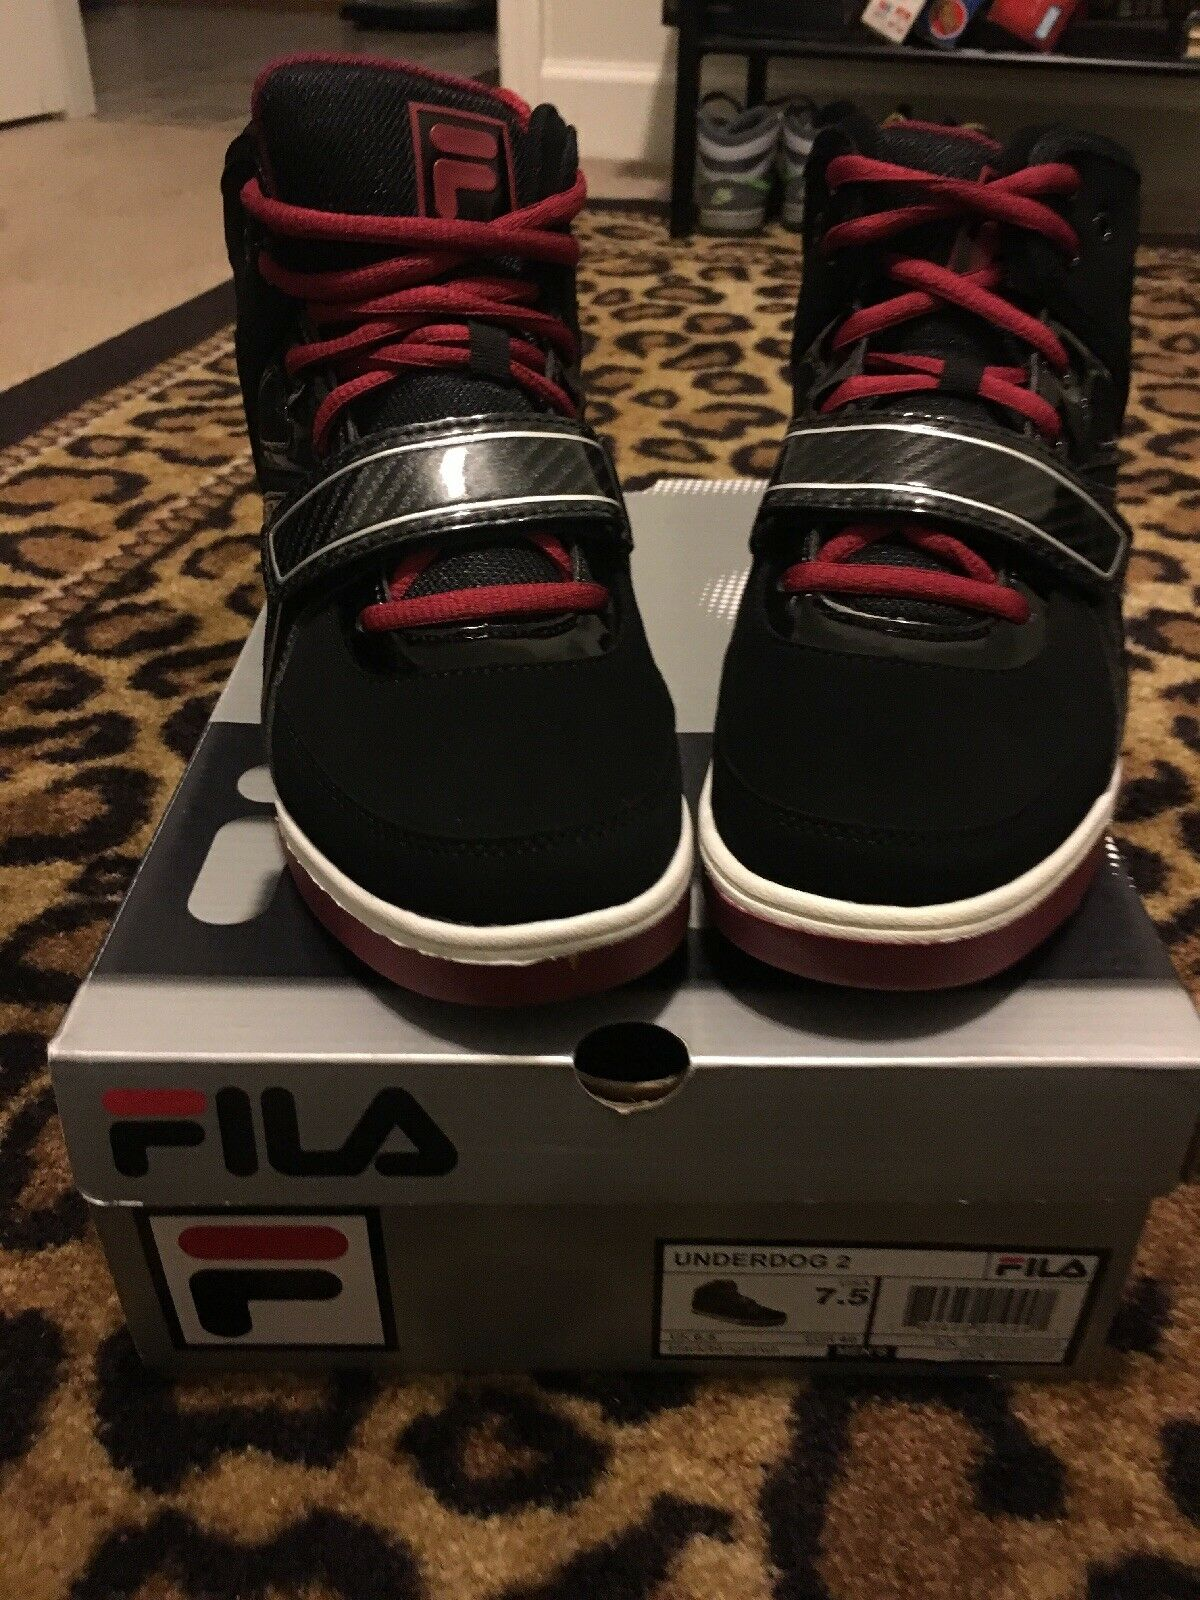 Fila Men's Underdog 2 High Top Athletic Tennis Shoes Sz 7.5 MultiColor Sneakers